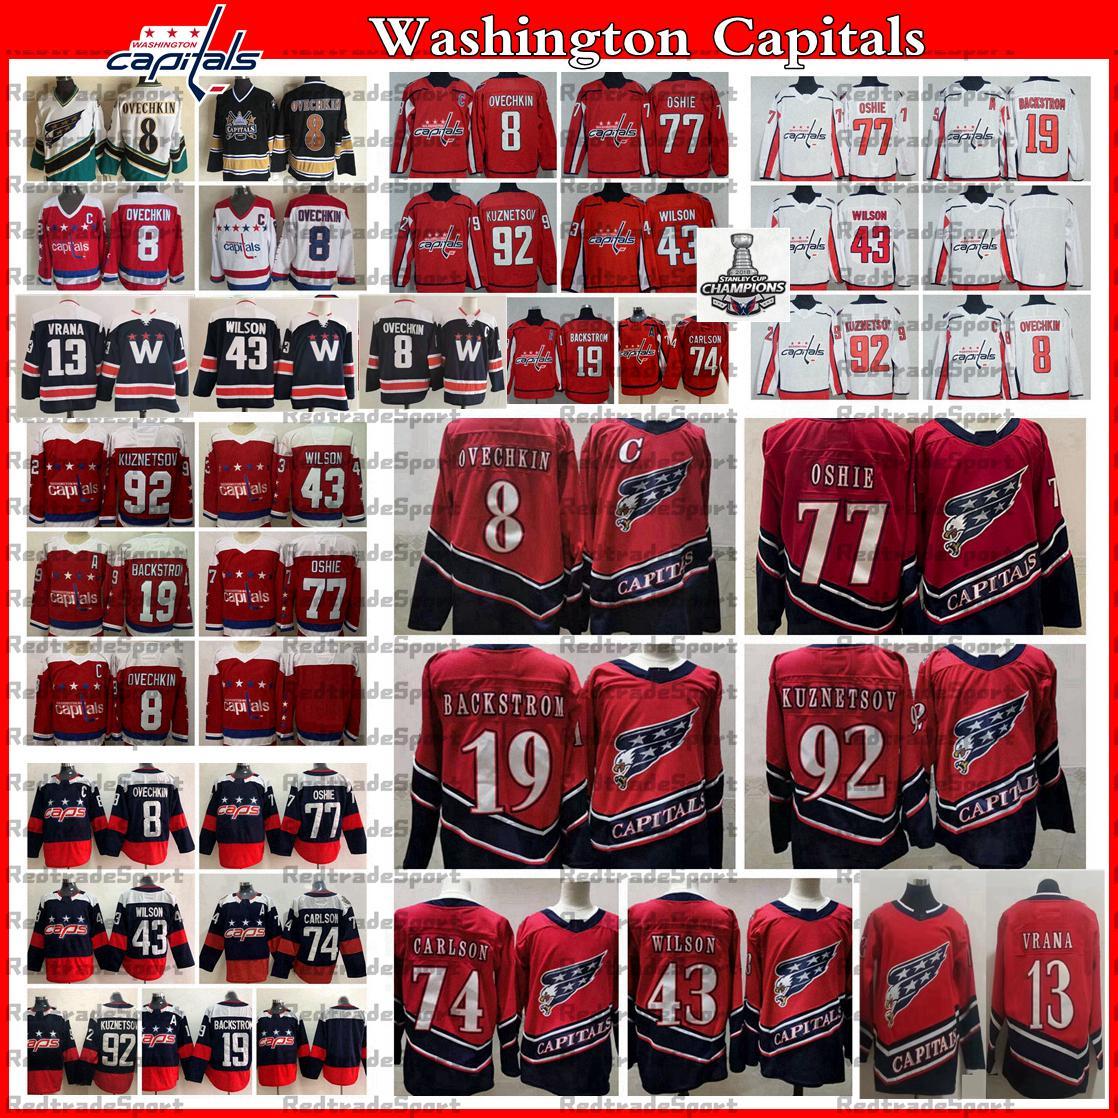 2021 Reverse Retro Washington Capitals 8 Alex Ovechkin TJ Oshie Hockey Jersey Evgeny Kuznetsov Backstrom Tom Wilson John Carlson Jakub Vrana Champions Shirt